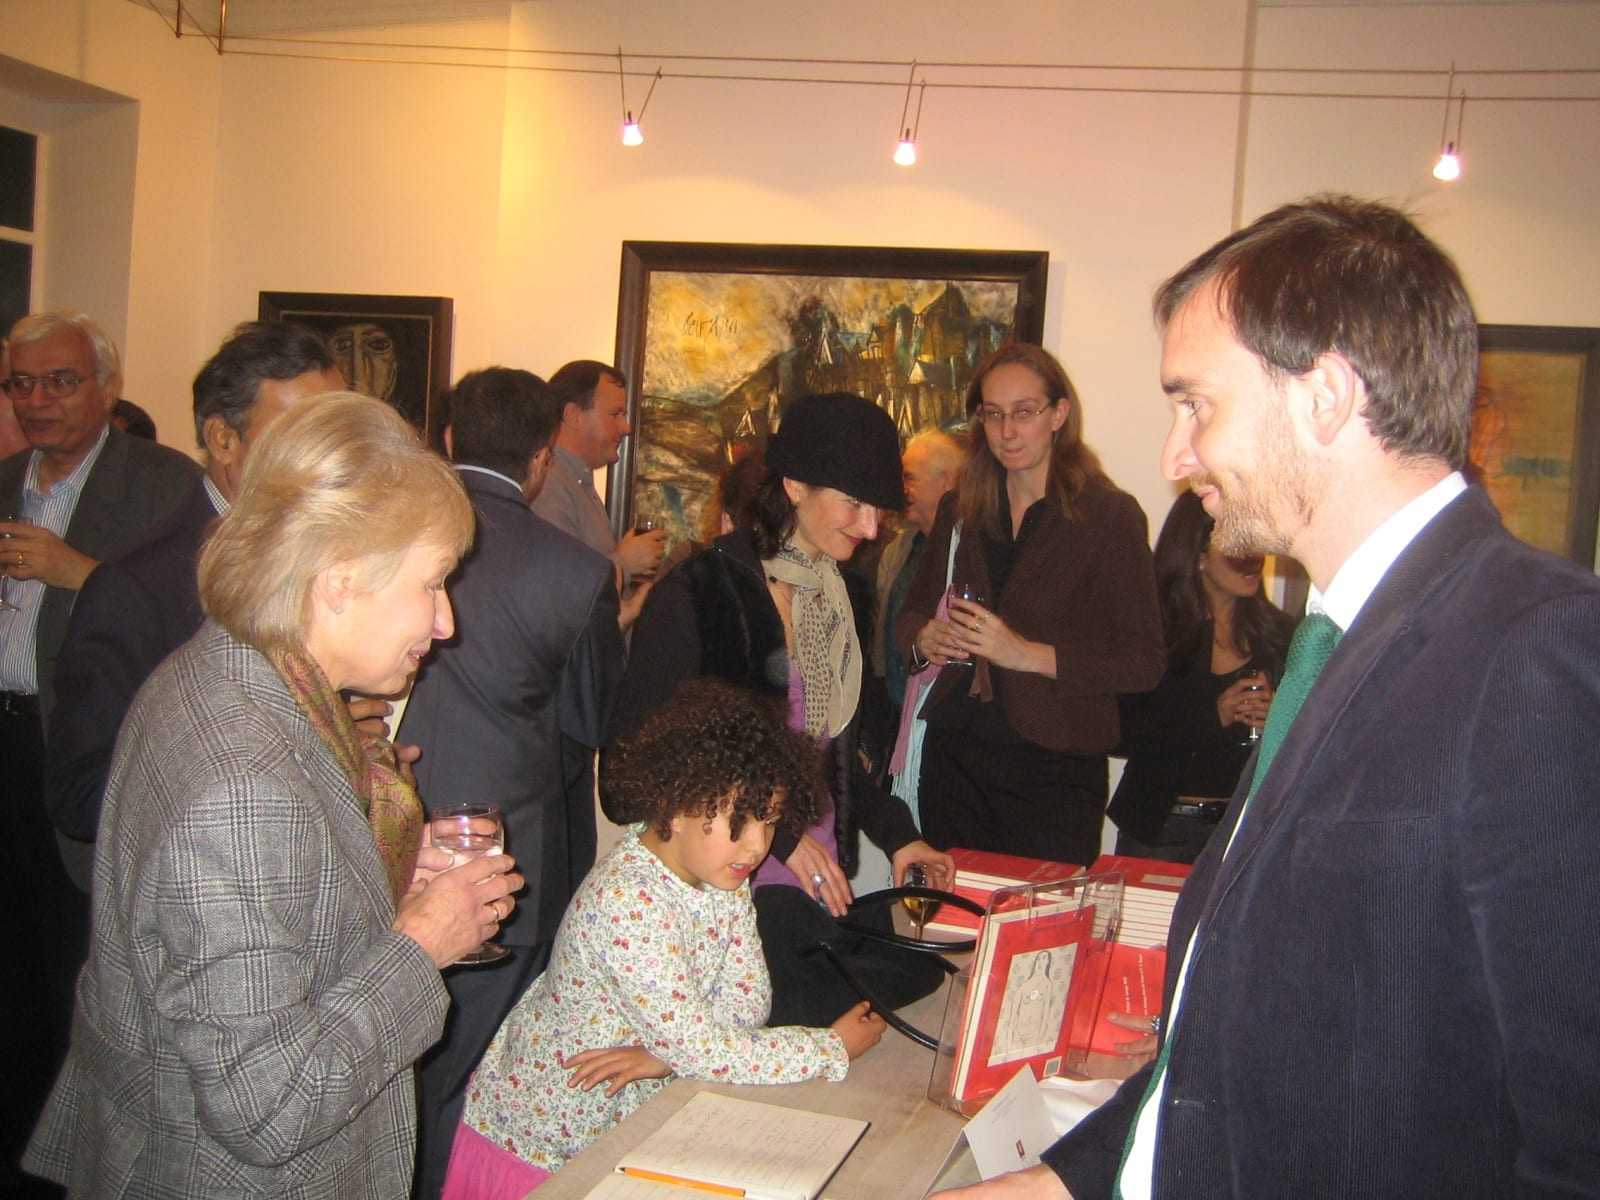 FN Souza, Grosvenor Gallery, 2005